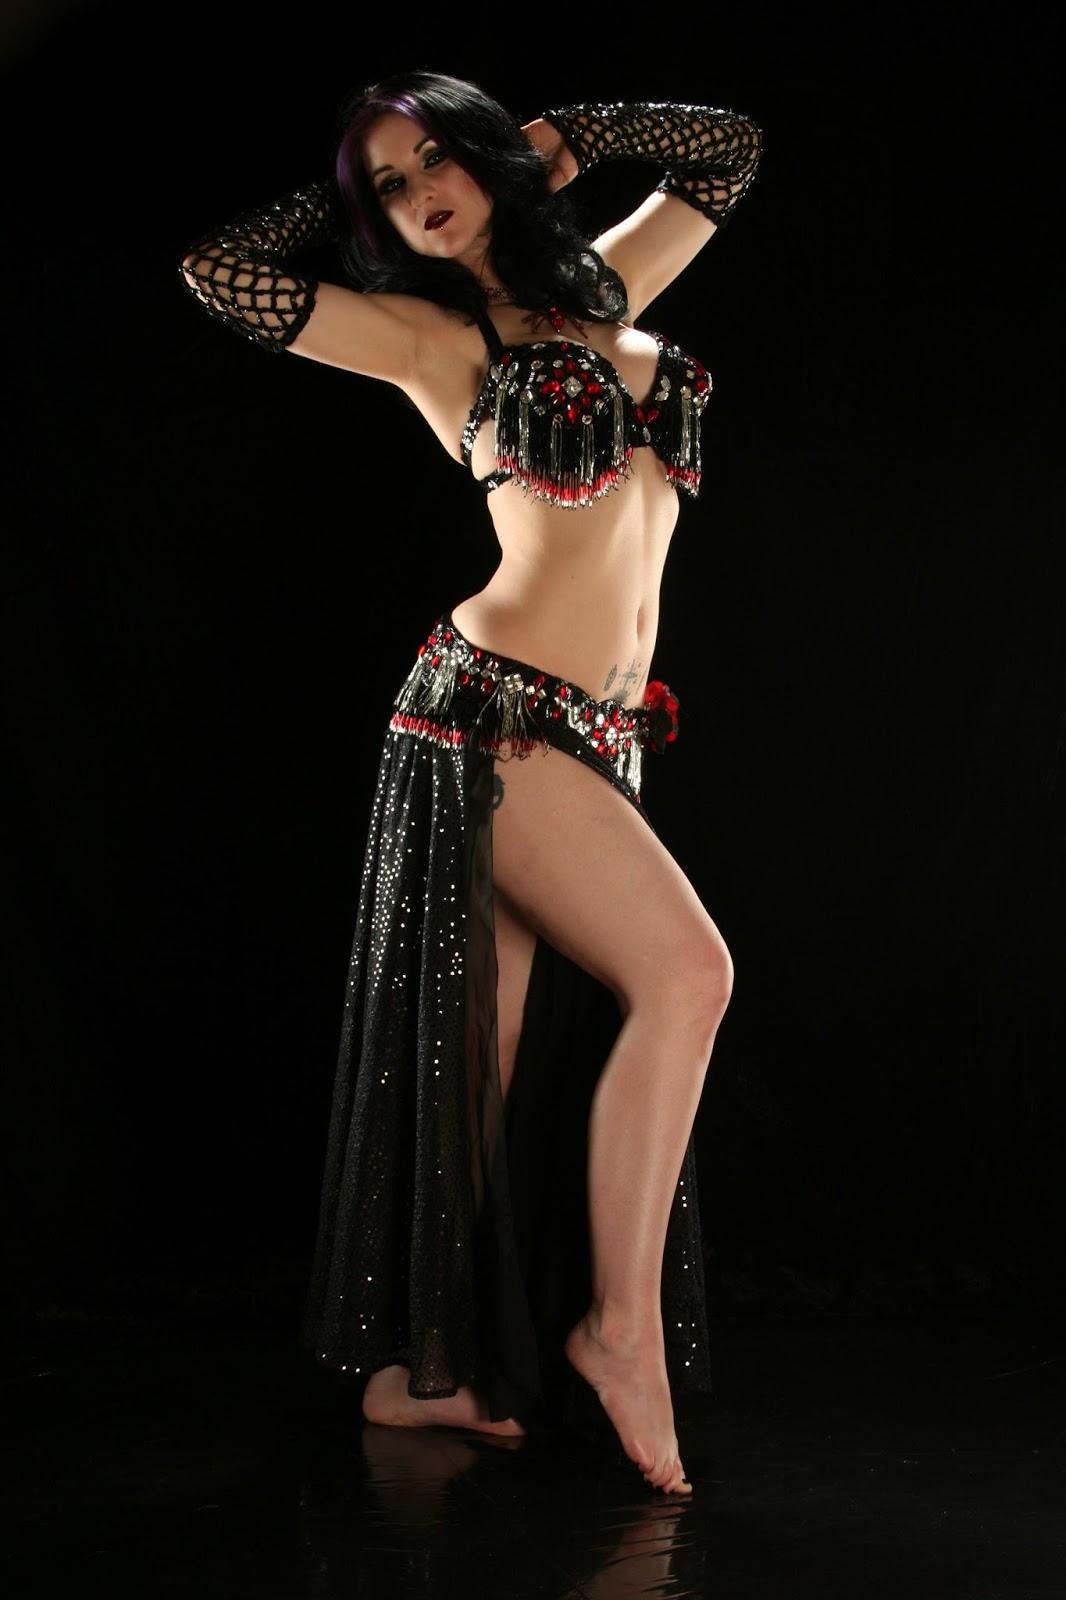 Sunny Leone's Pole Dancing